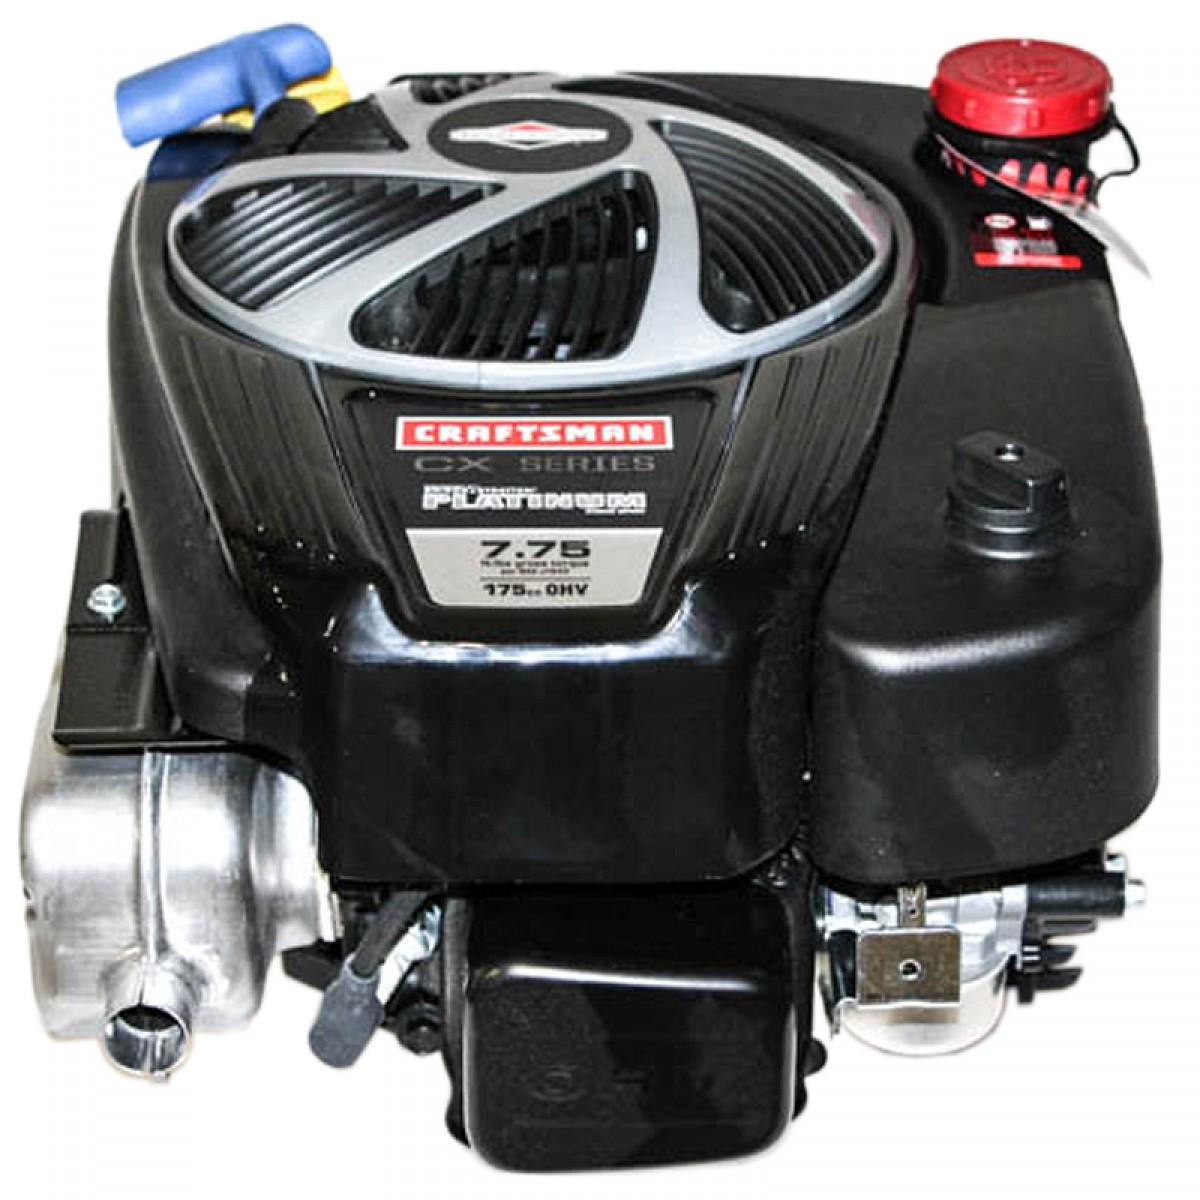 Motor B&S SERIA 775 PROFESSIONAL OHV 25,4mm x 80mm